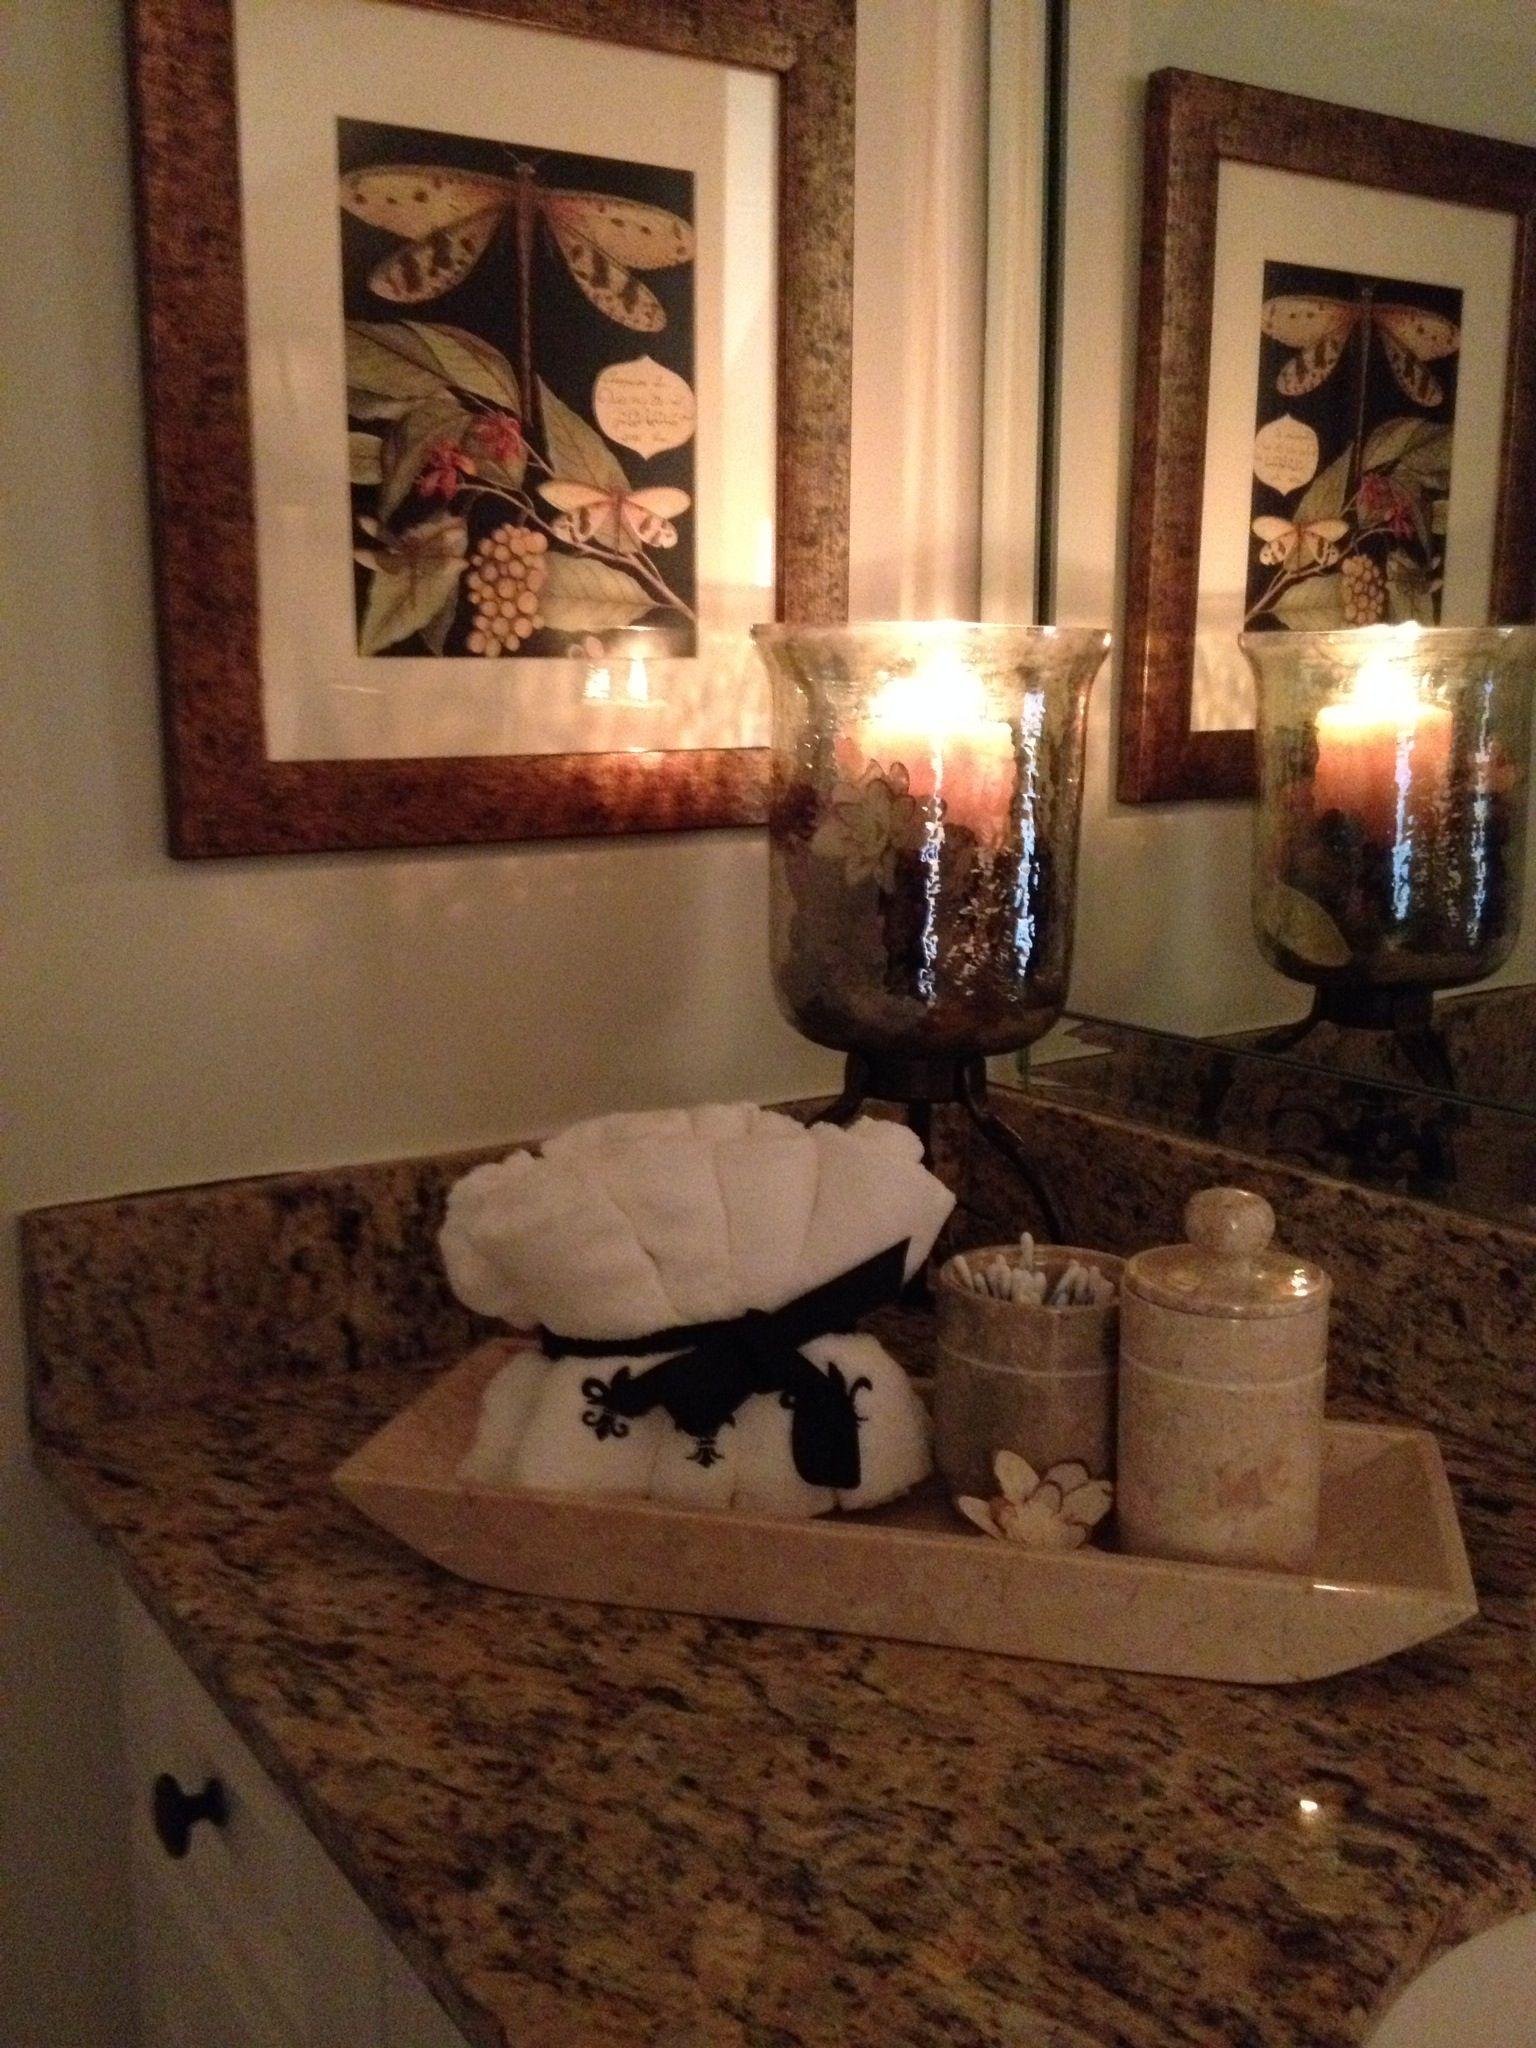 Bathroom Items Especially Nice For Guests Bathroom Decor Bathroom Towels Decor